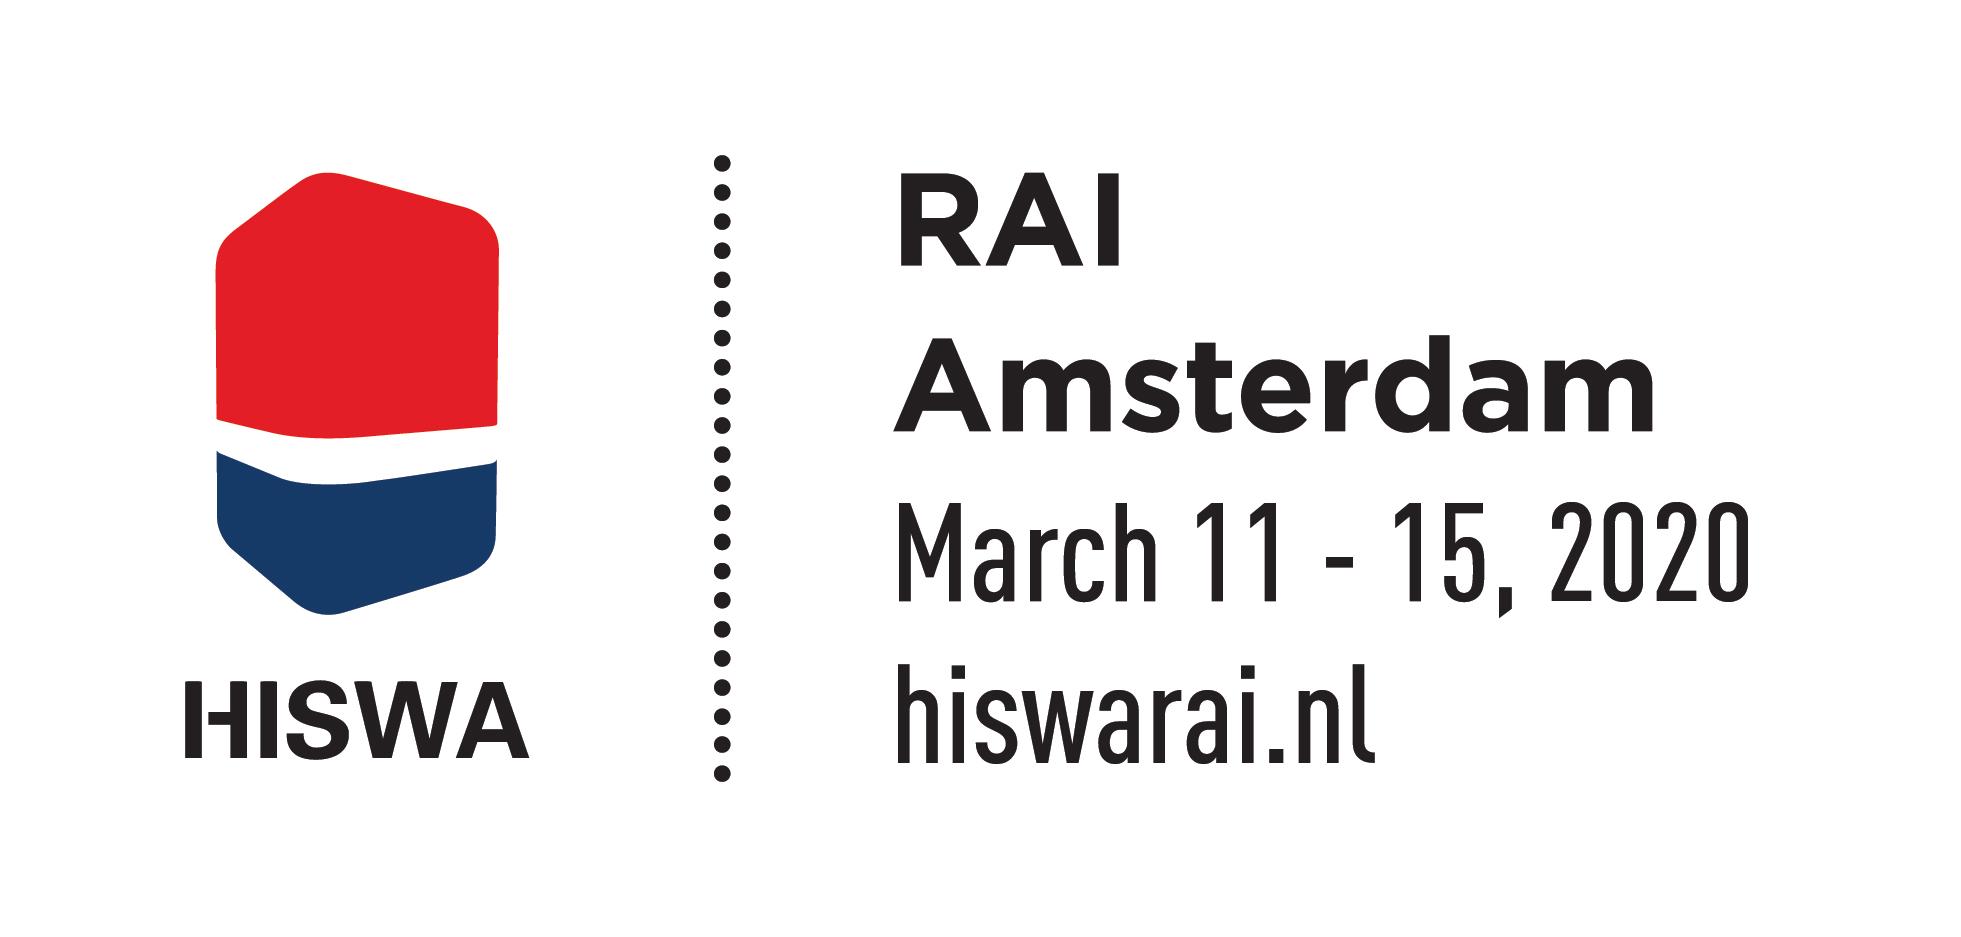 HISWA event RAI Amsterdam banner